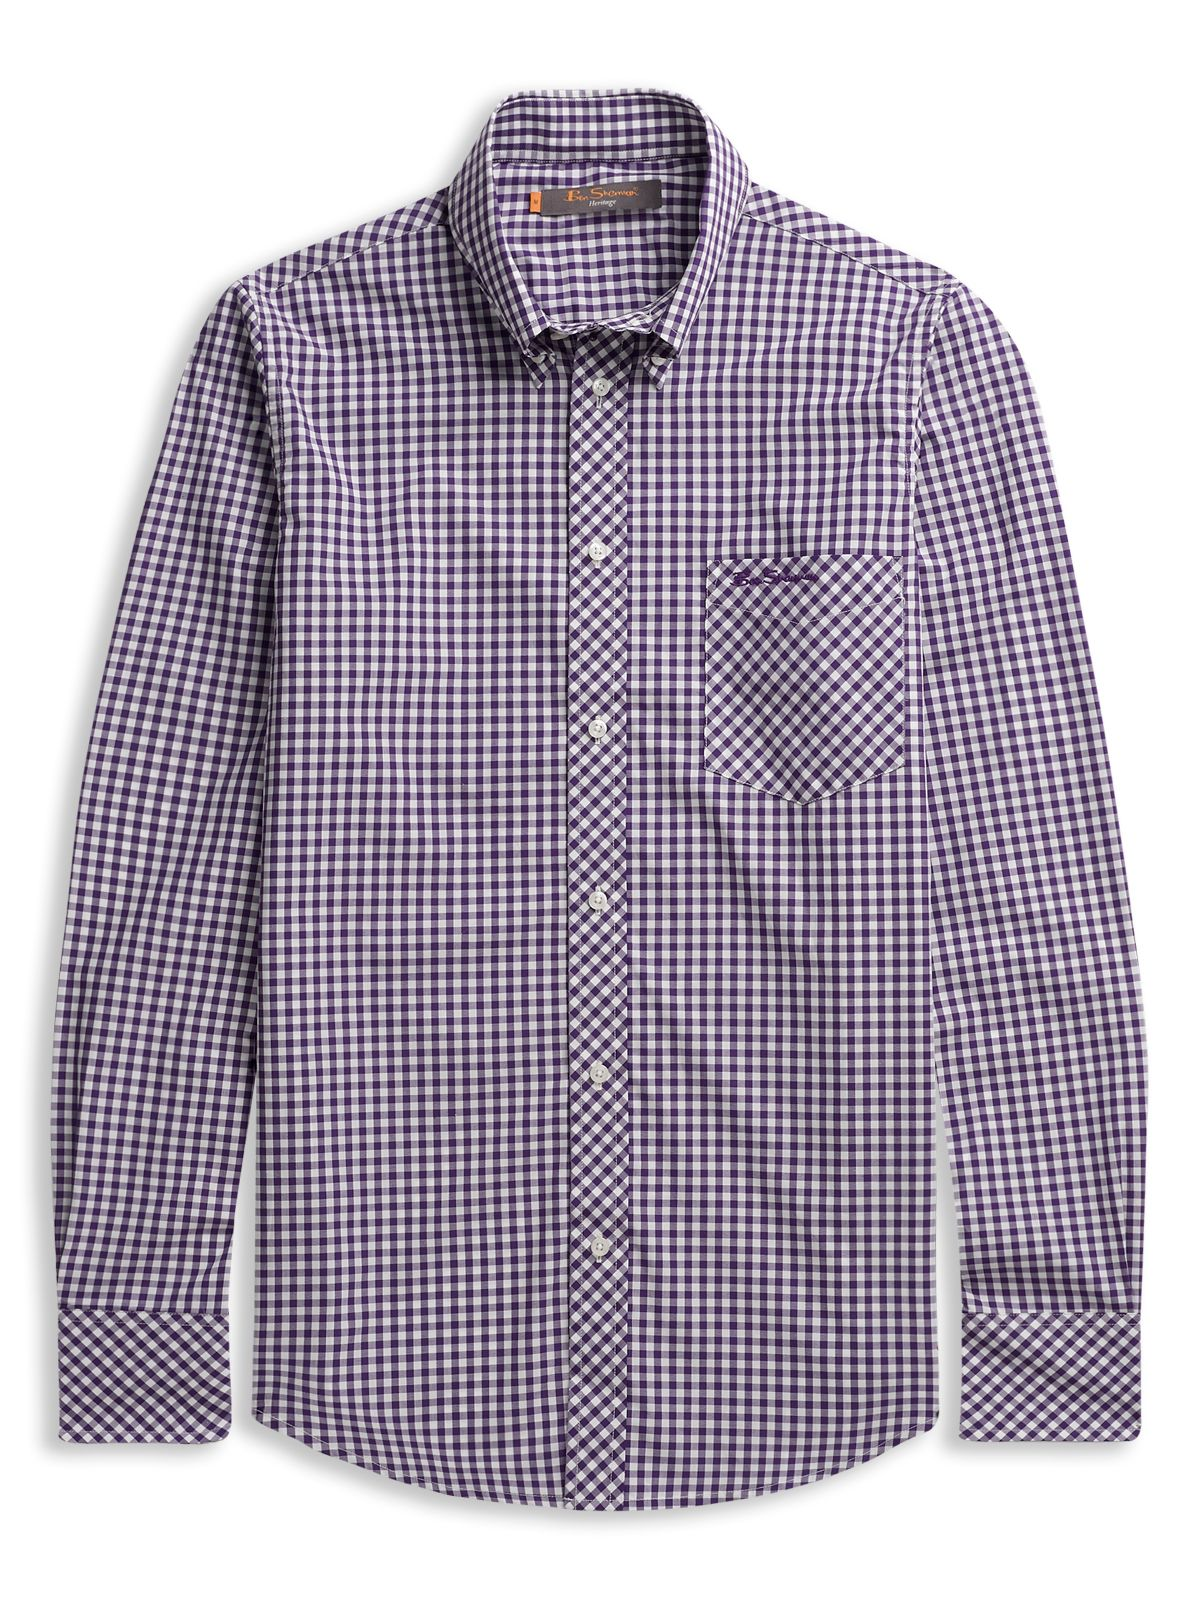 Ben Sherman Longsleeve Gingham Shirt In Purple For Men